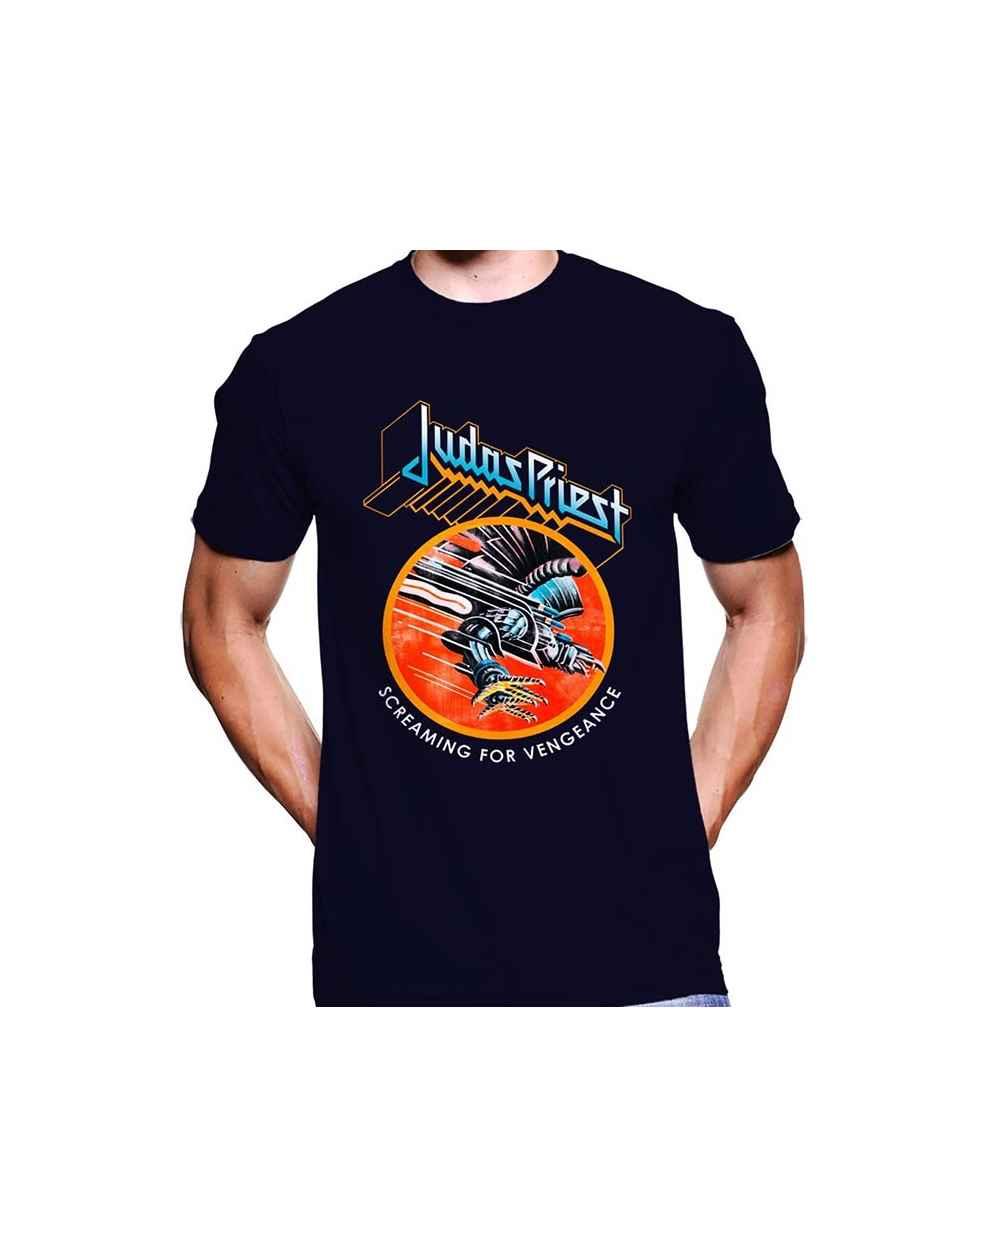 Camiseta Estampada Hombre Judas Priest 02